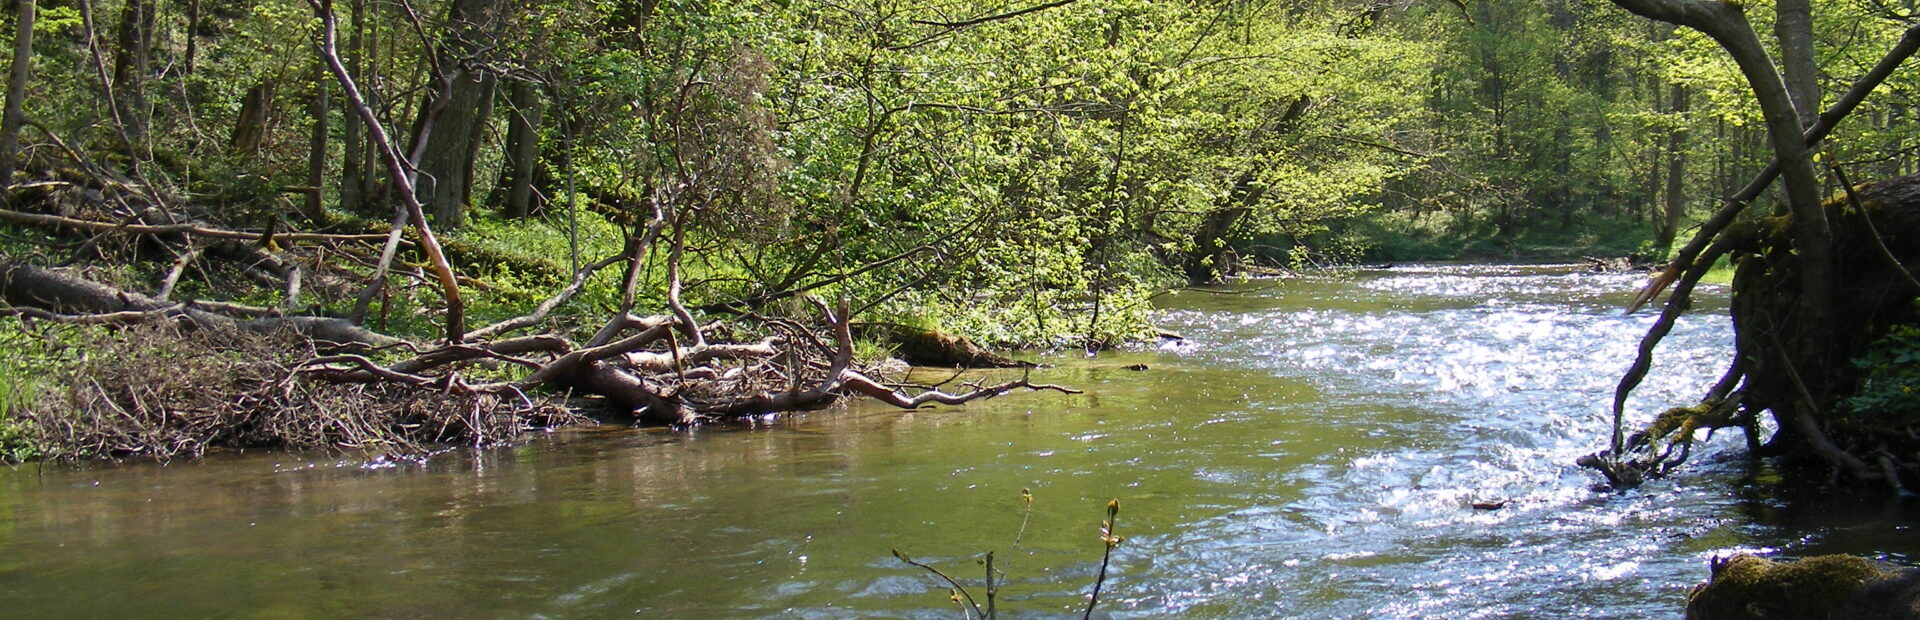 The Radunia river water trail